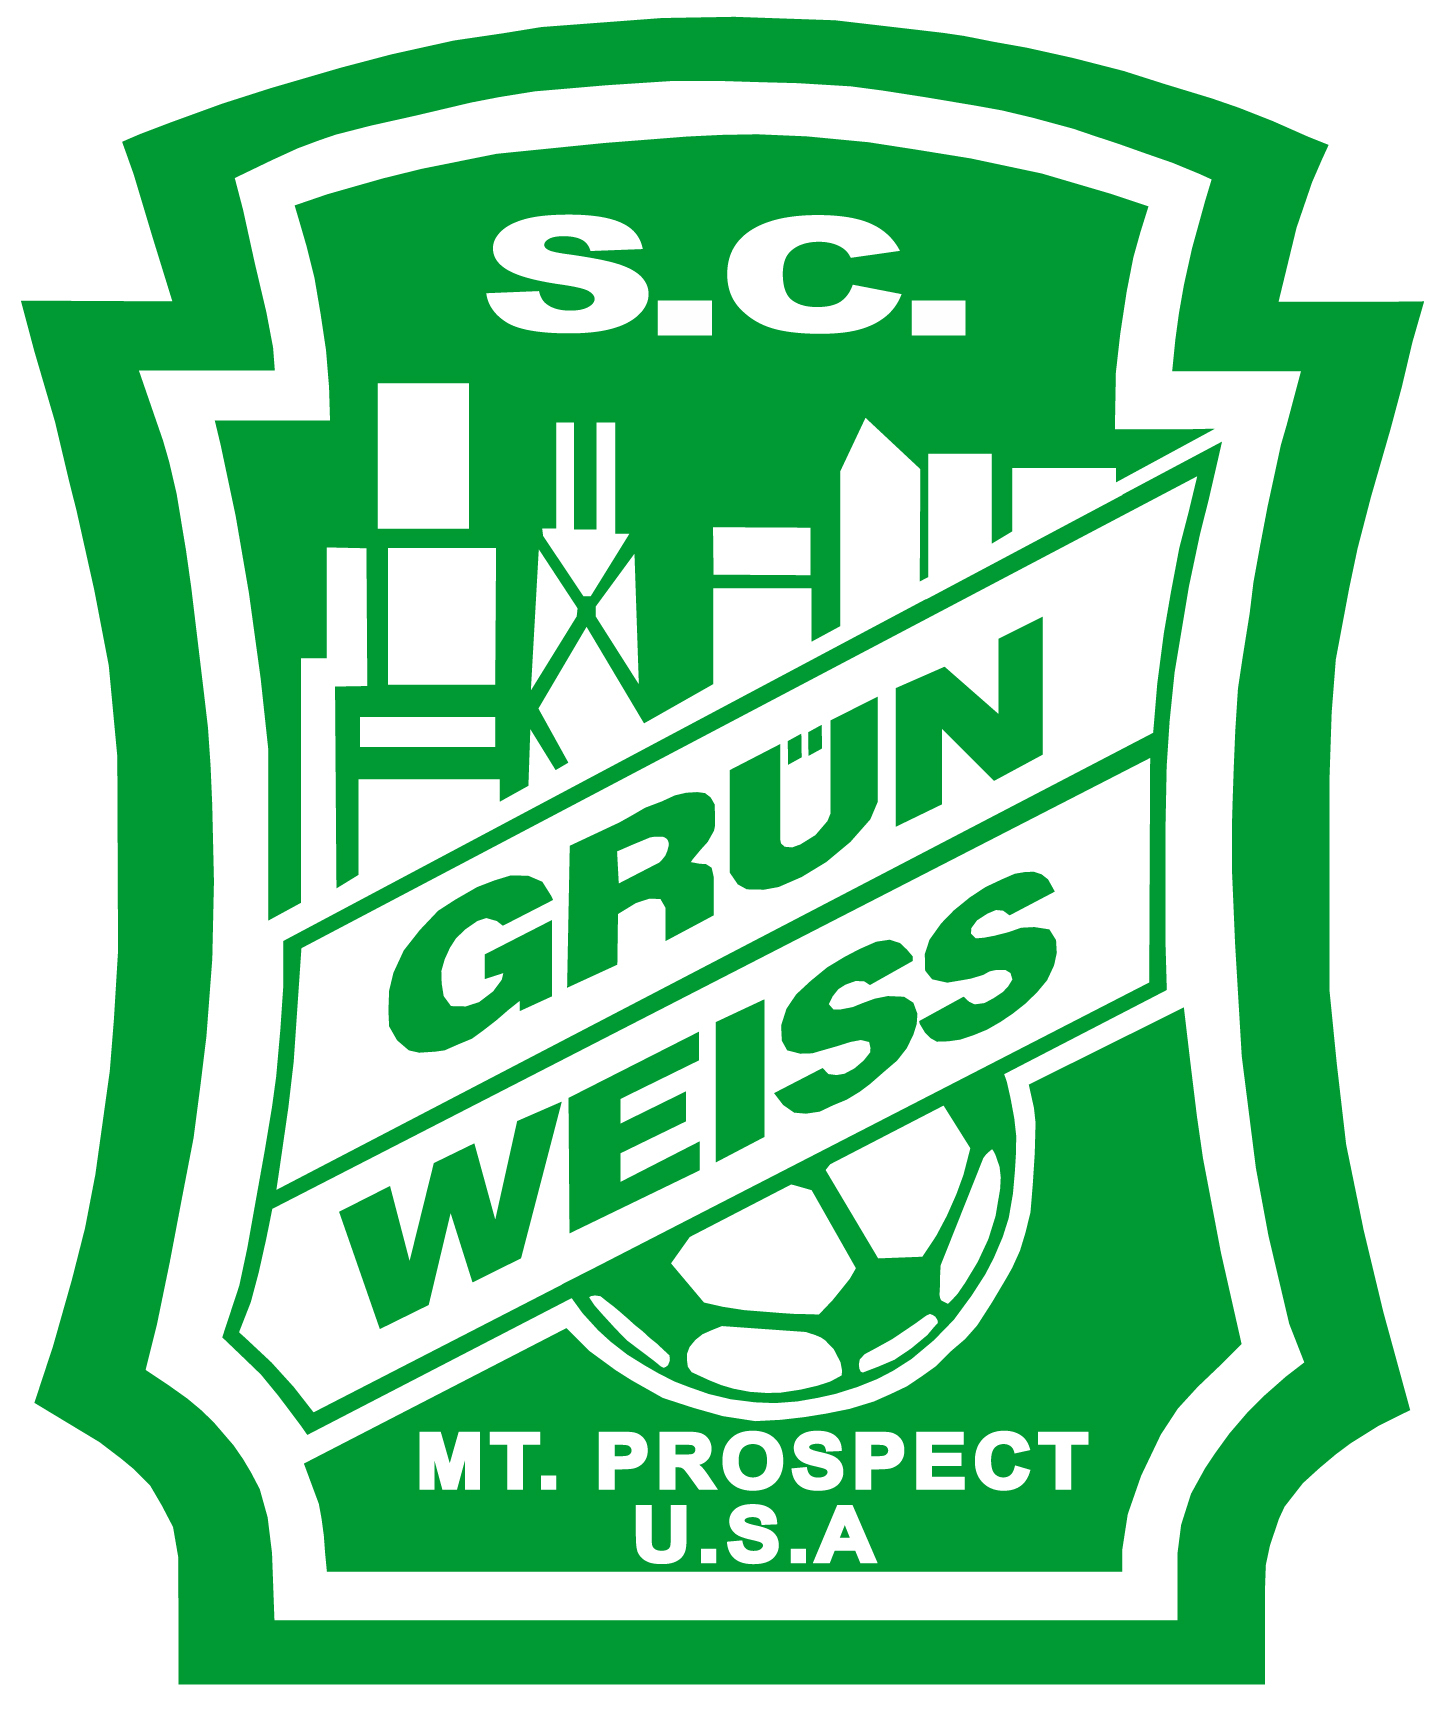 Green_white_logo_Green.jpg